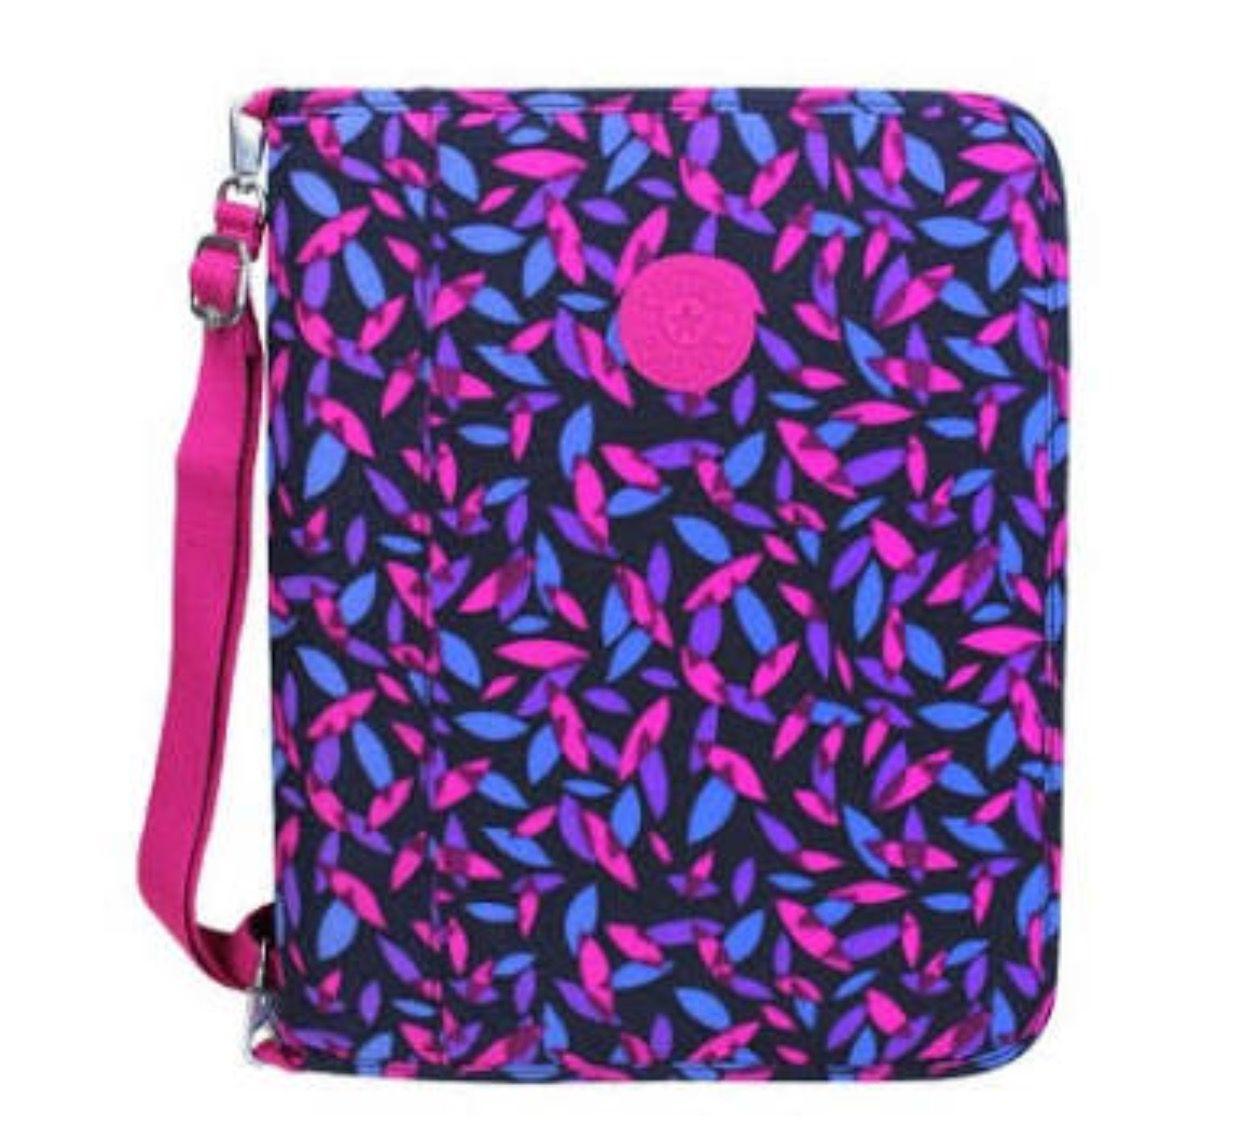 4b9abe928 Kipling Bags, Jansport, Beautiful Bags, Binder, Quis, Tumblers, Notebook,